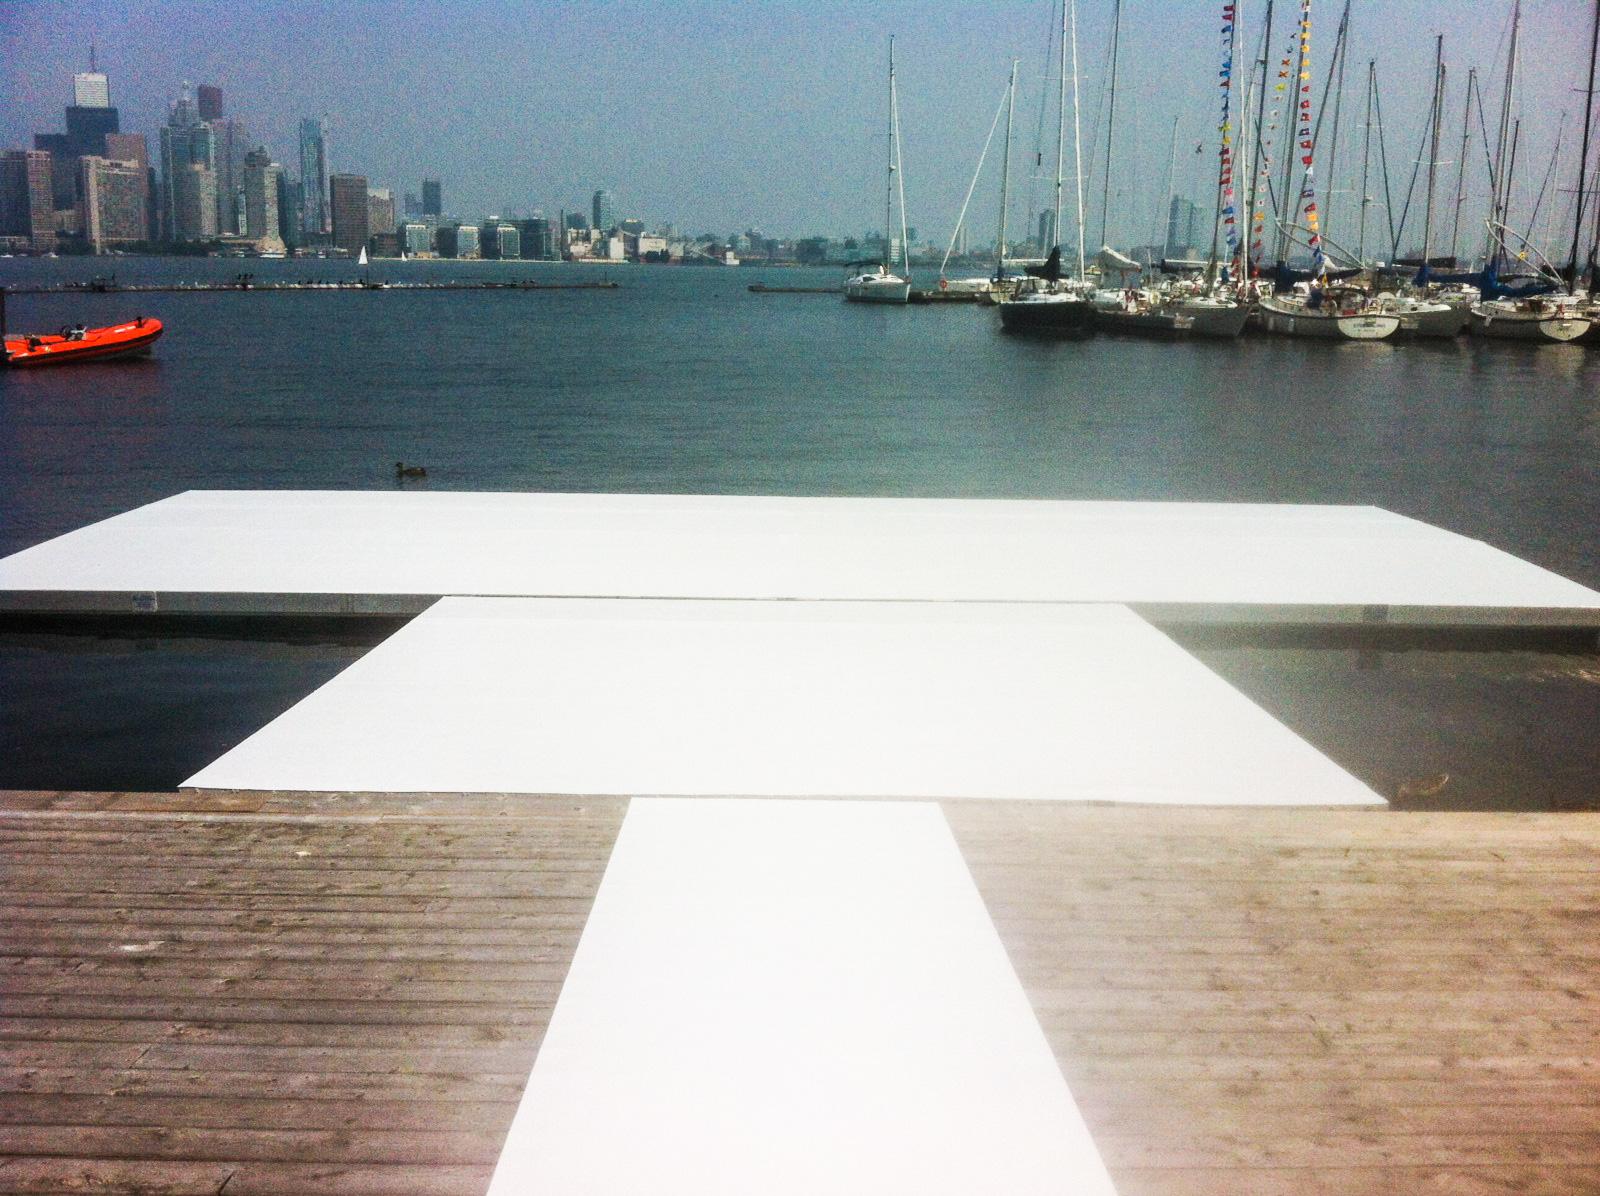 Chalk white event carpet on the pier